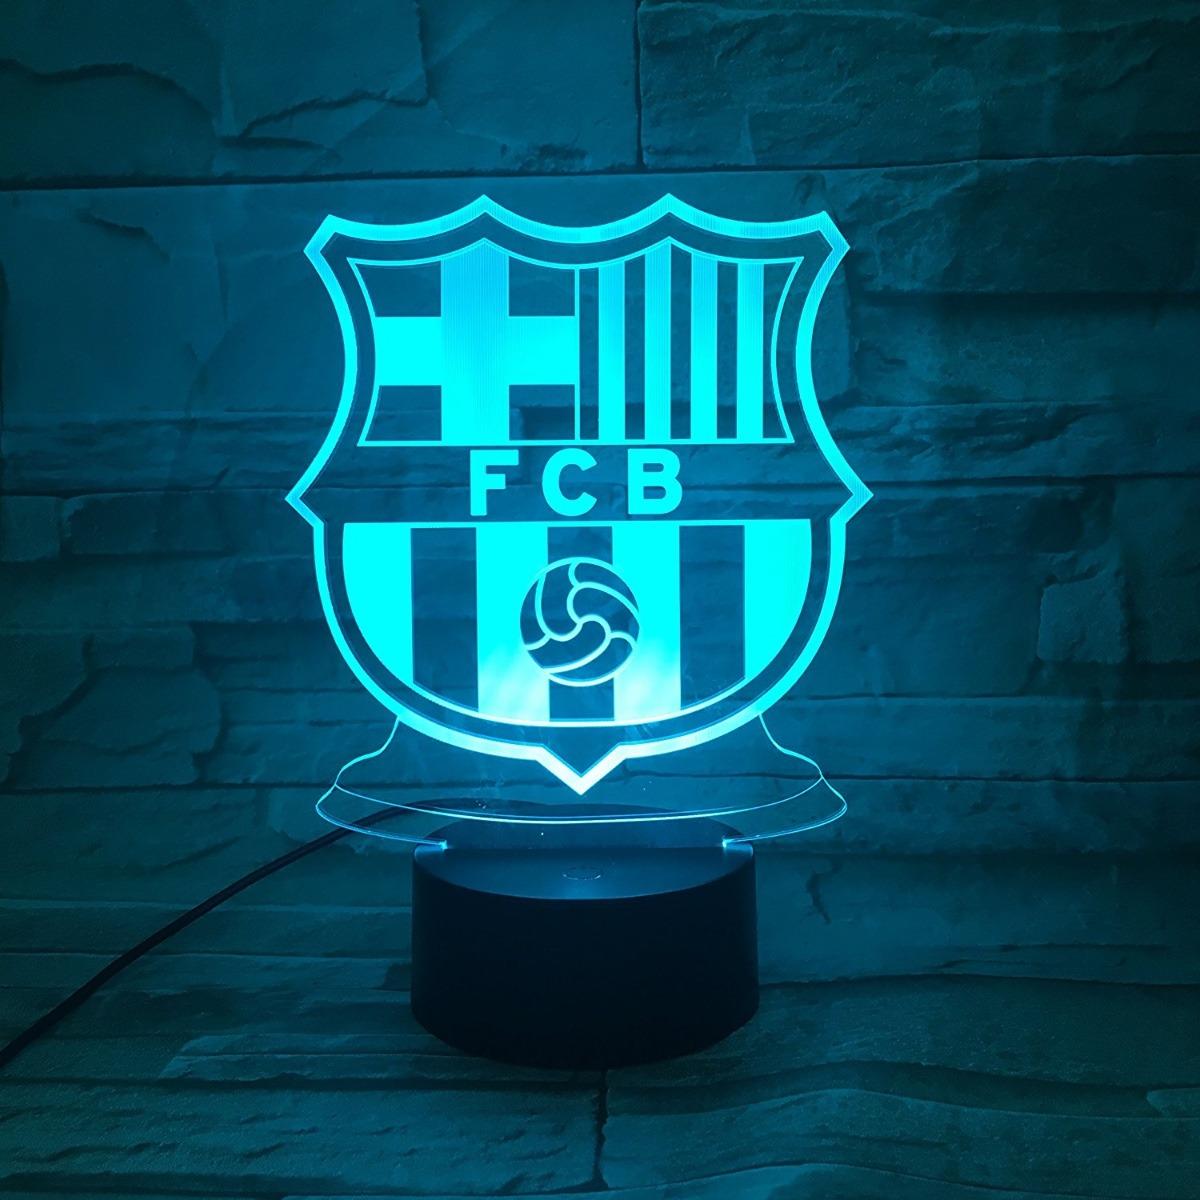 Barcelona Logo 3d Wallpaper Escudo Fc Barcelona Lampara Efecto 3d Fan Camiseta Futbol